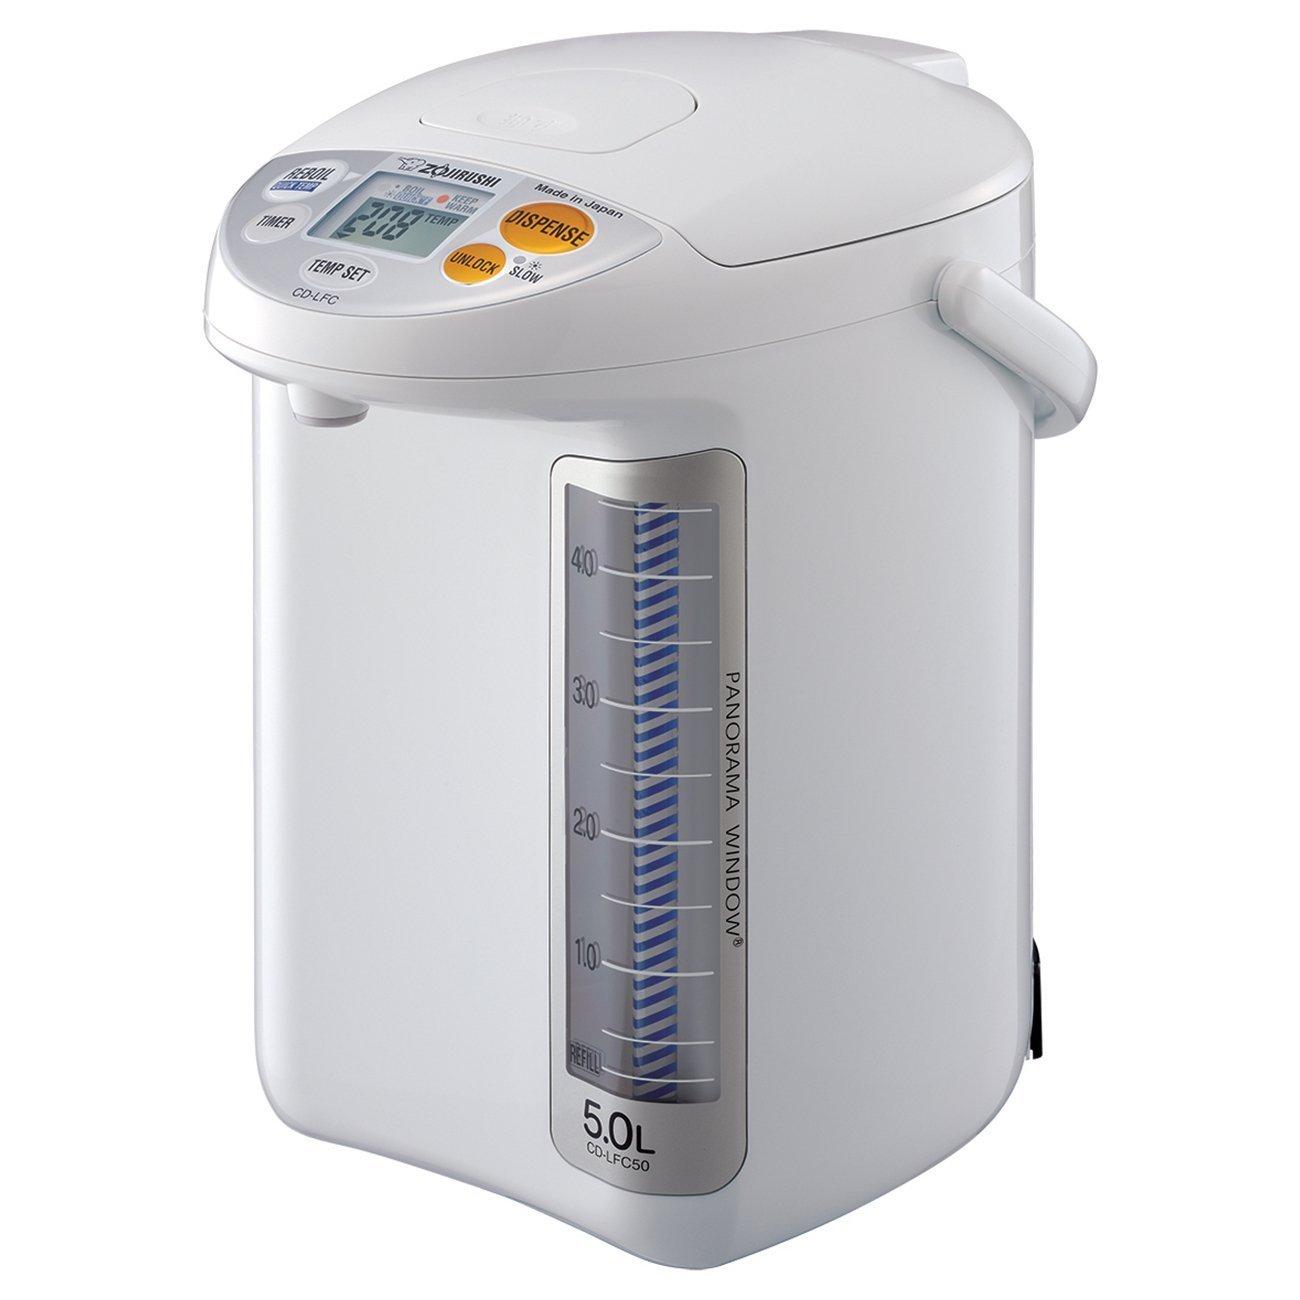 Zojirushi CD-LFC50 Panorama Window Micom Water Boiler and Warmer, 169 oz/5.0 L, White by Zojirushi